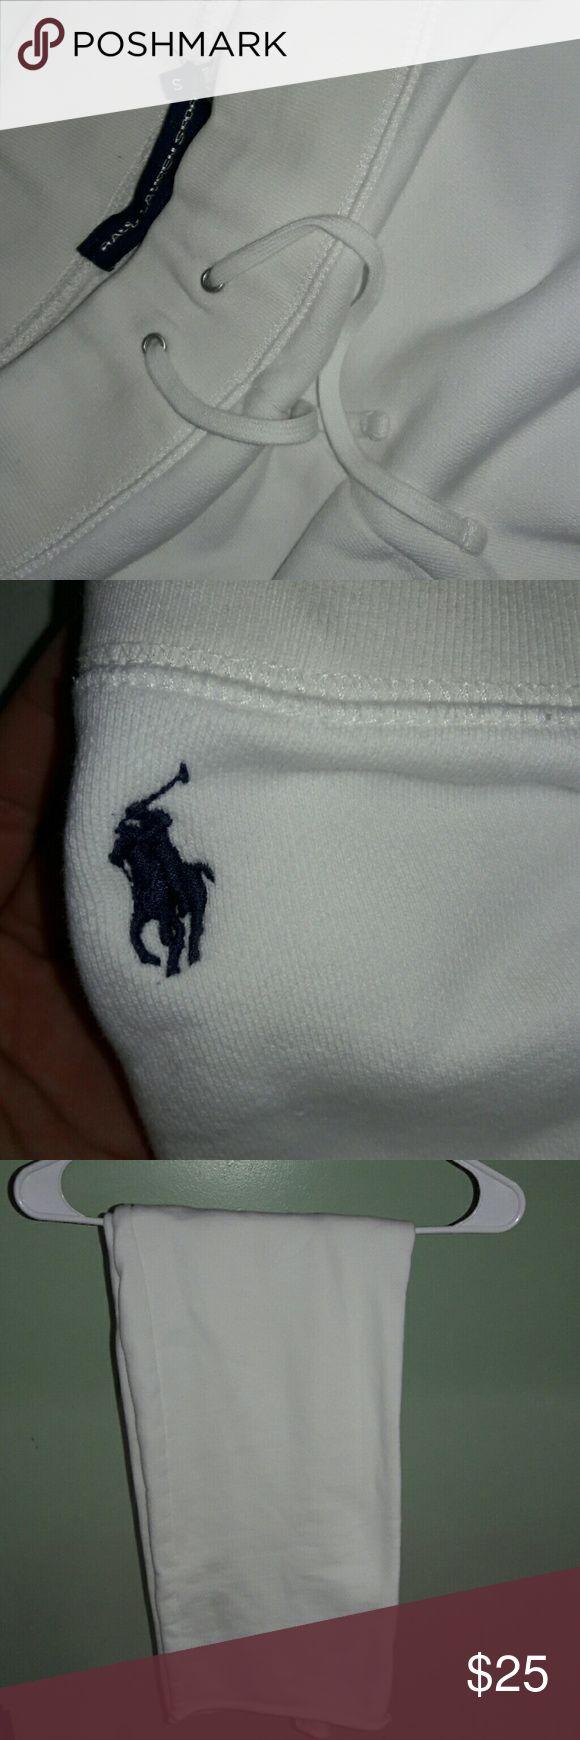 White polo sweatpants No stains, never worn Ralph Lauren Pants Track Pants & Joggers